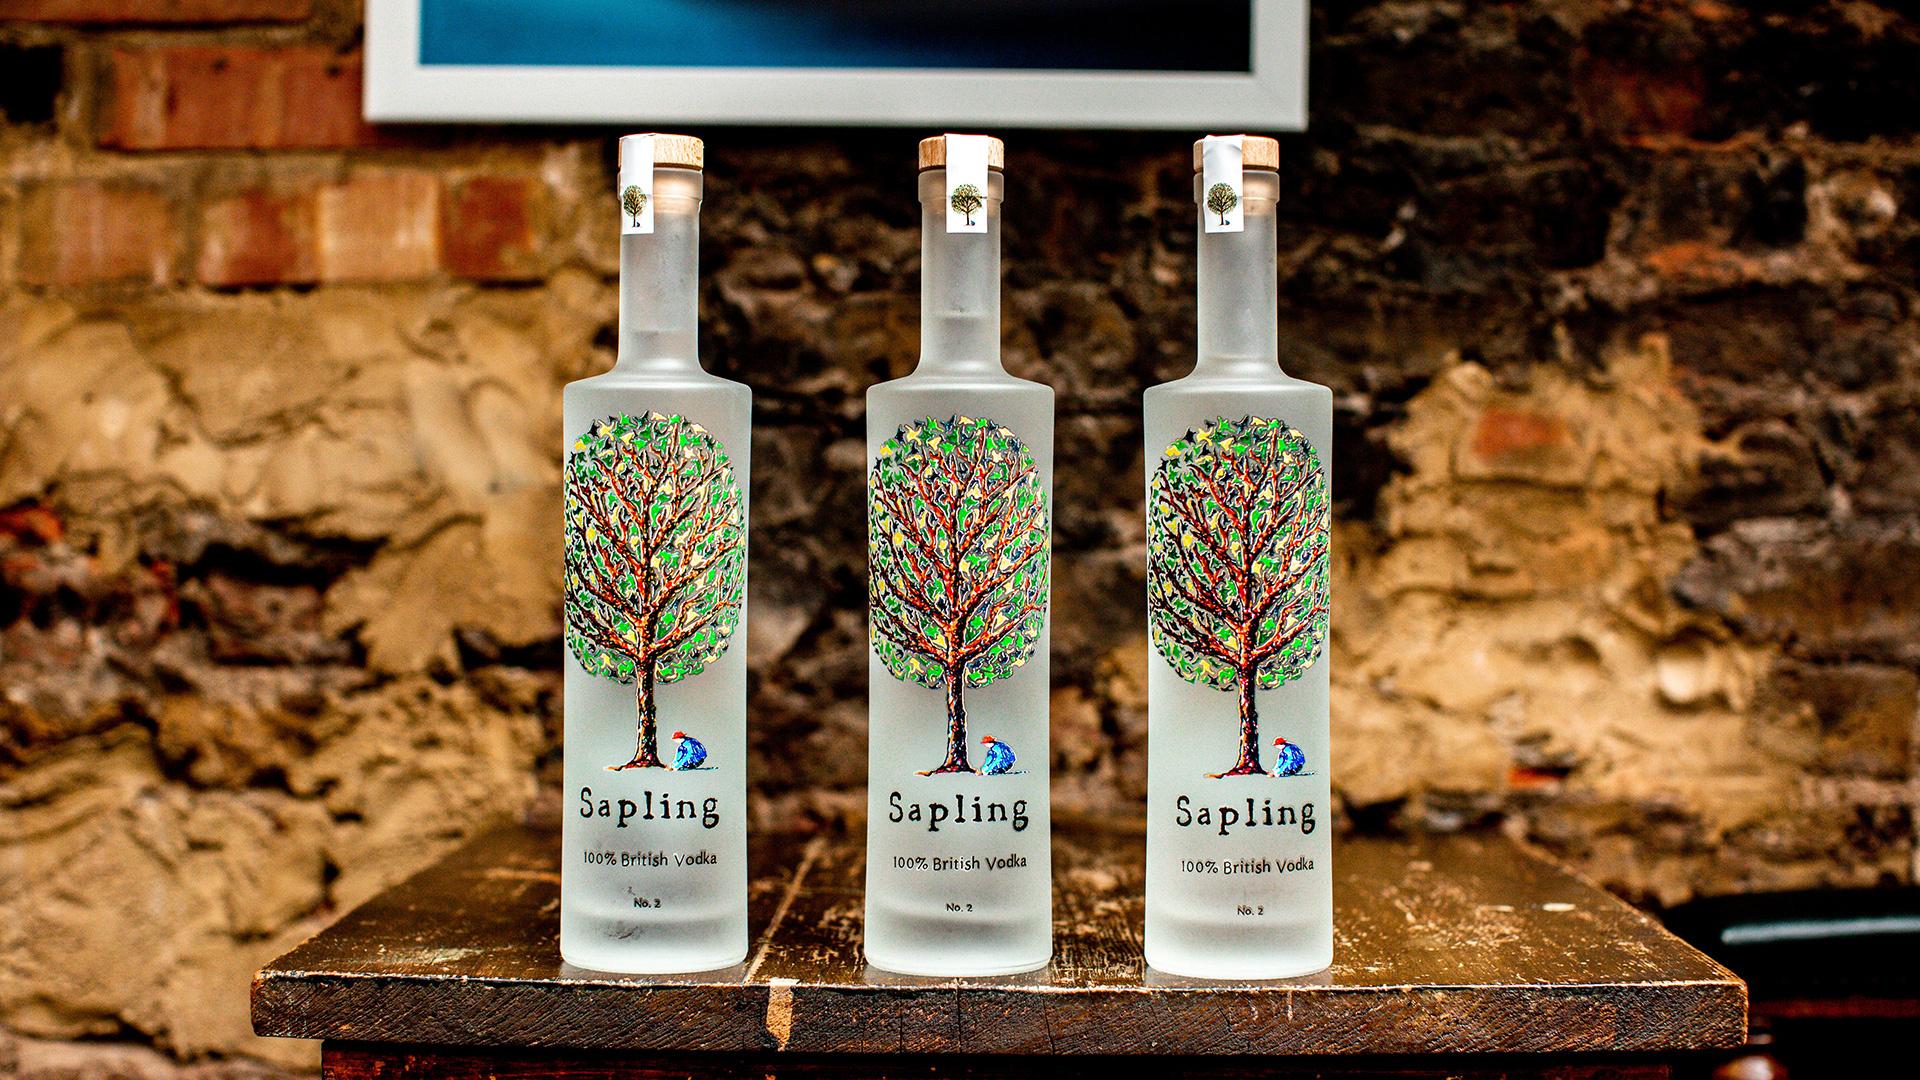 Win a case of Sapling Vodka worth £160